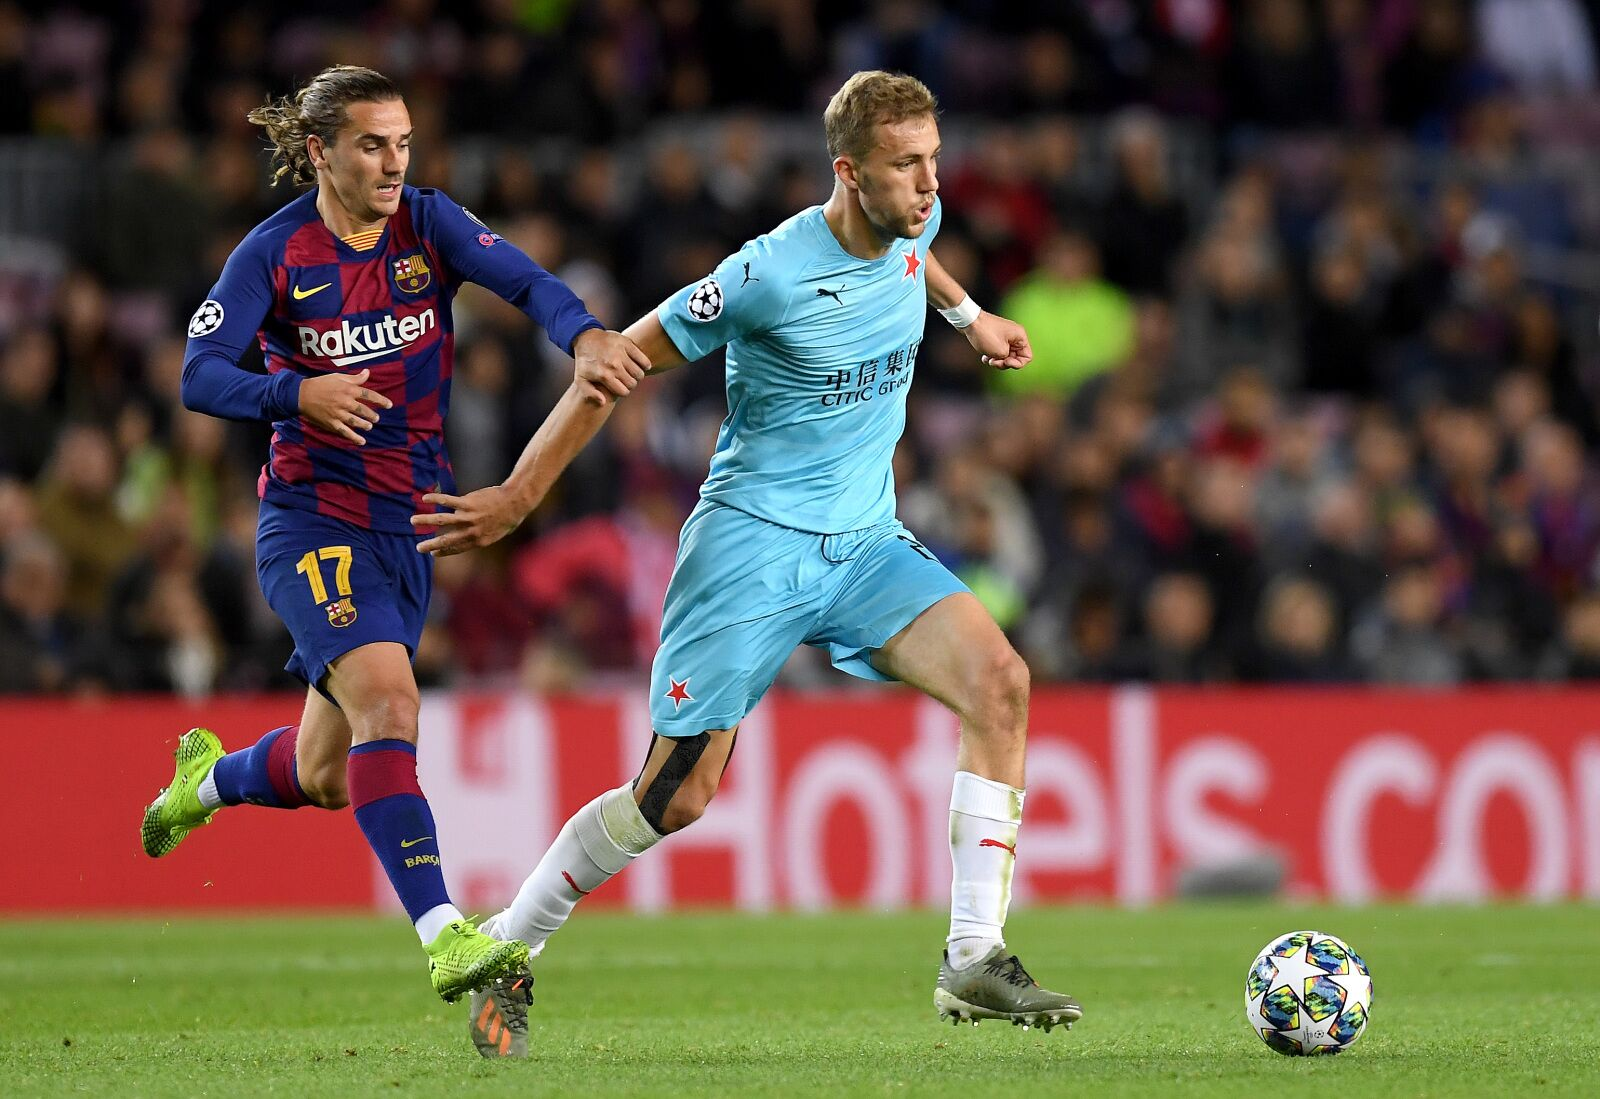 Can nearly announced midfielder Tomáš Souček Save West Ham?